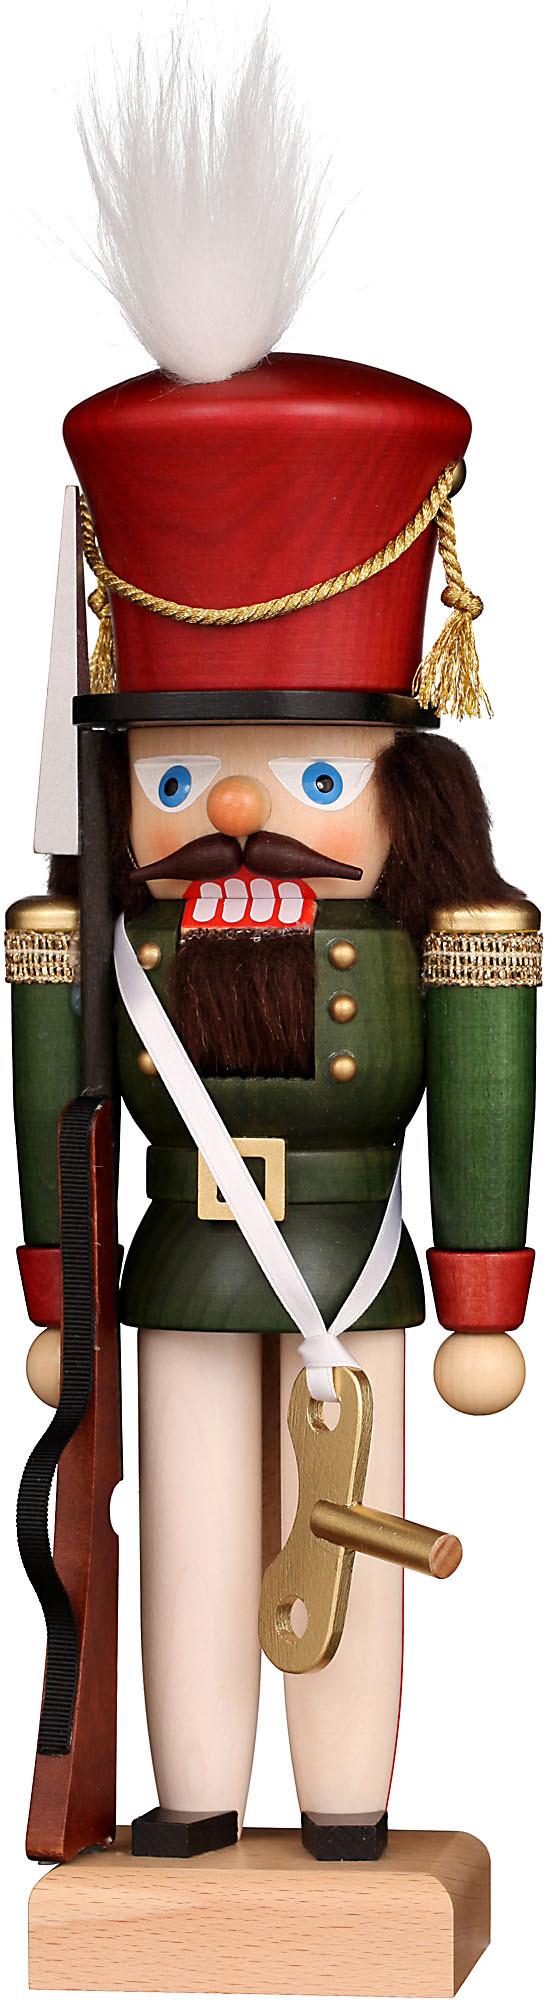 Christian Ulbricht Nussknacker Spielzeugsoldat